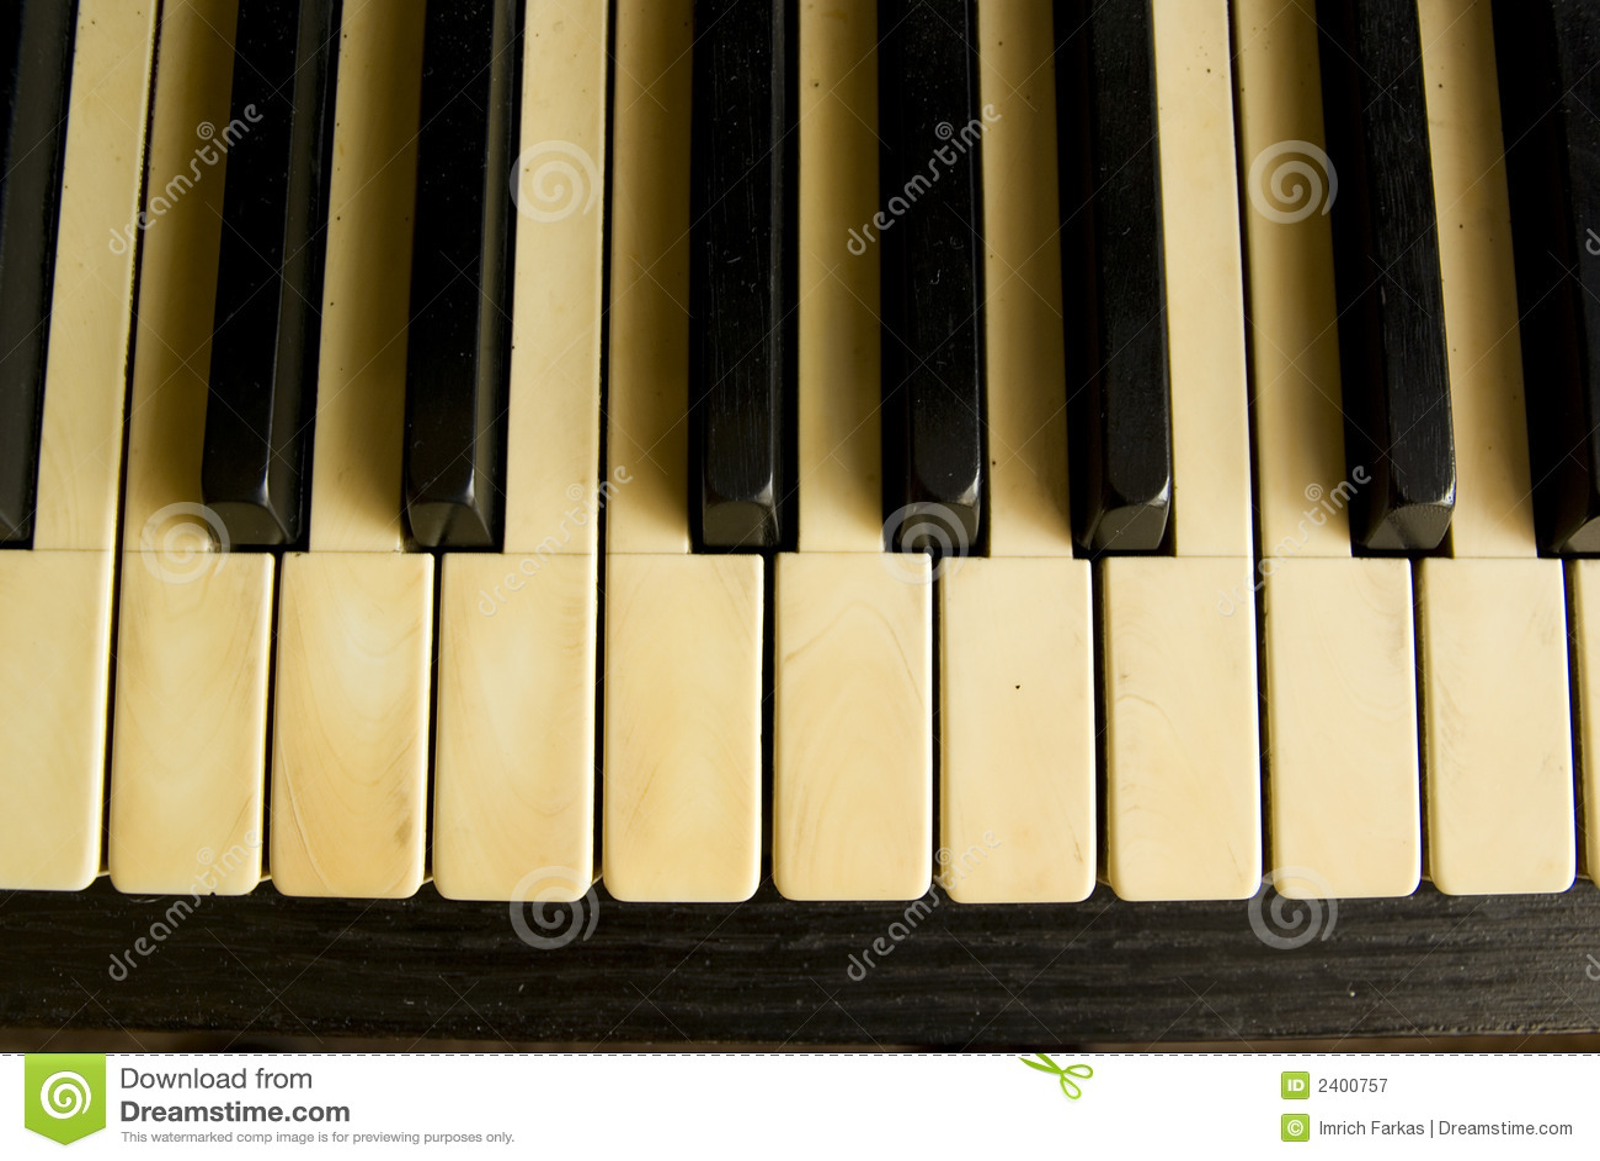 photo old piano - photo #48